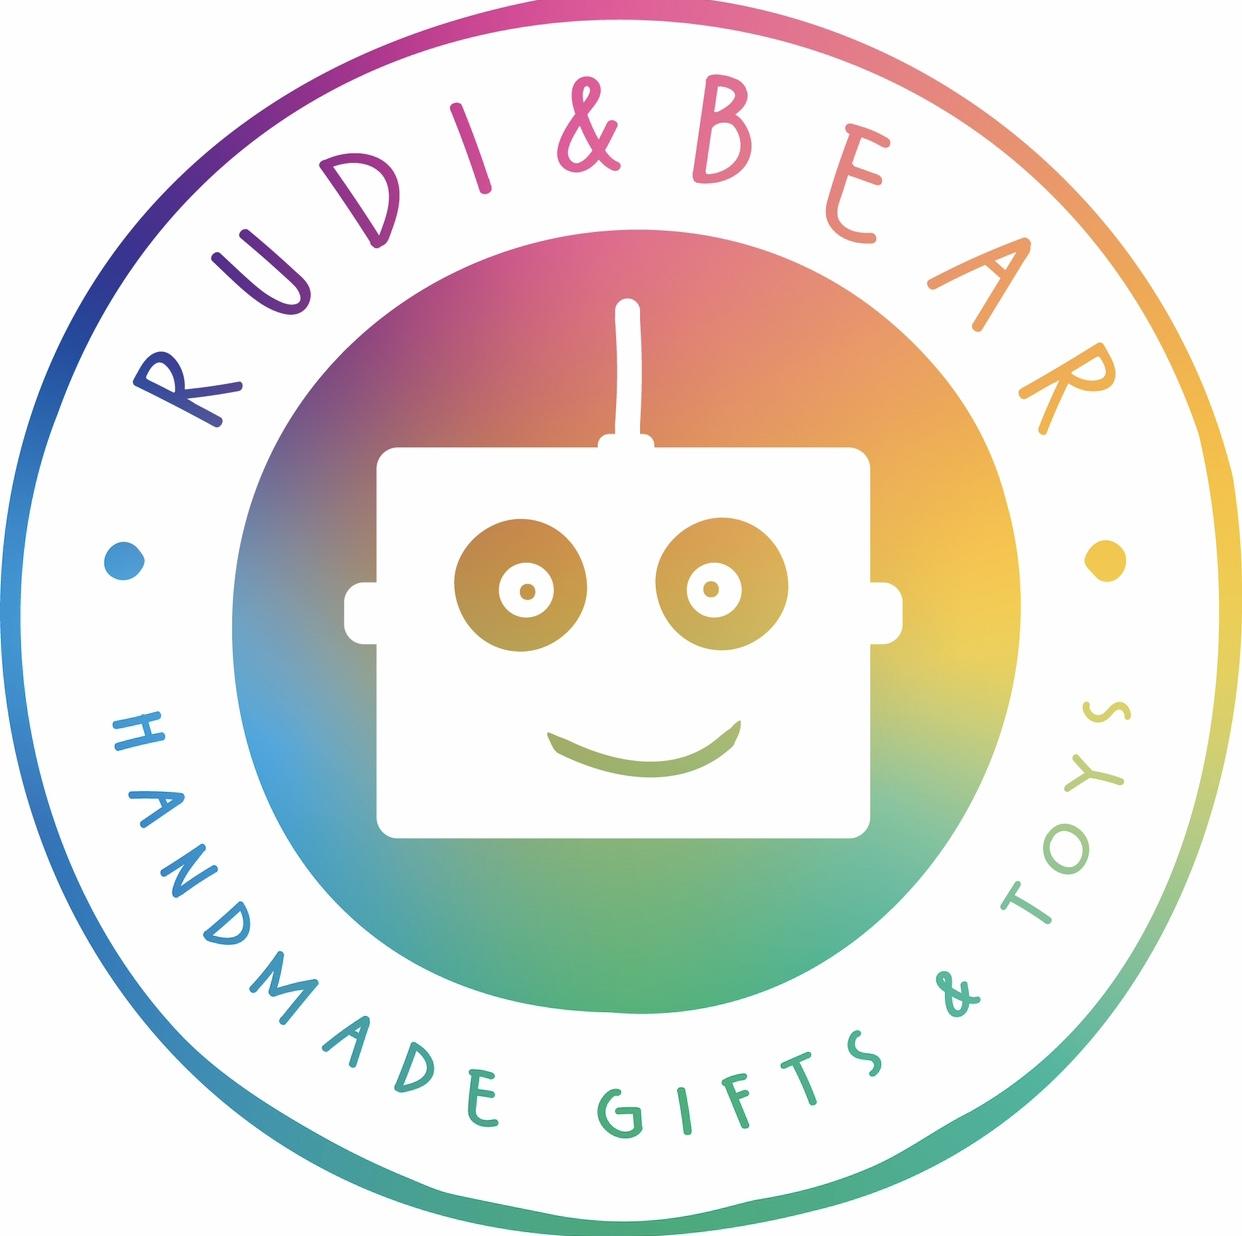 Rudi and Bear 's logo